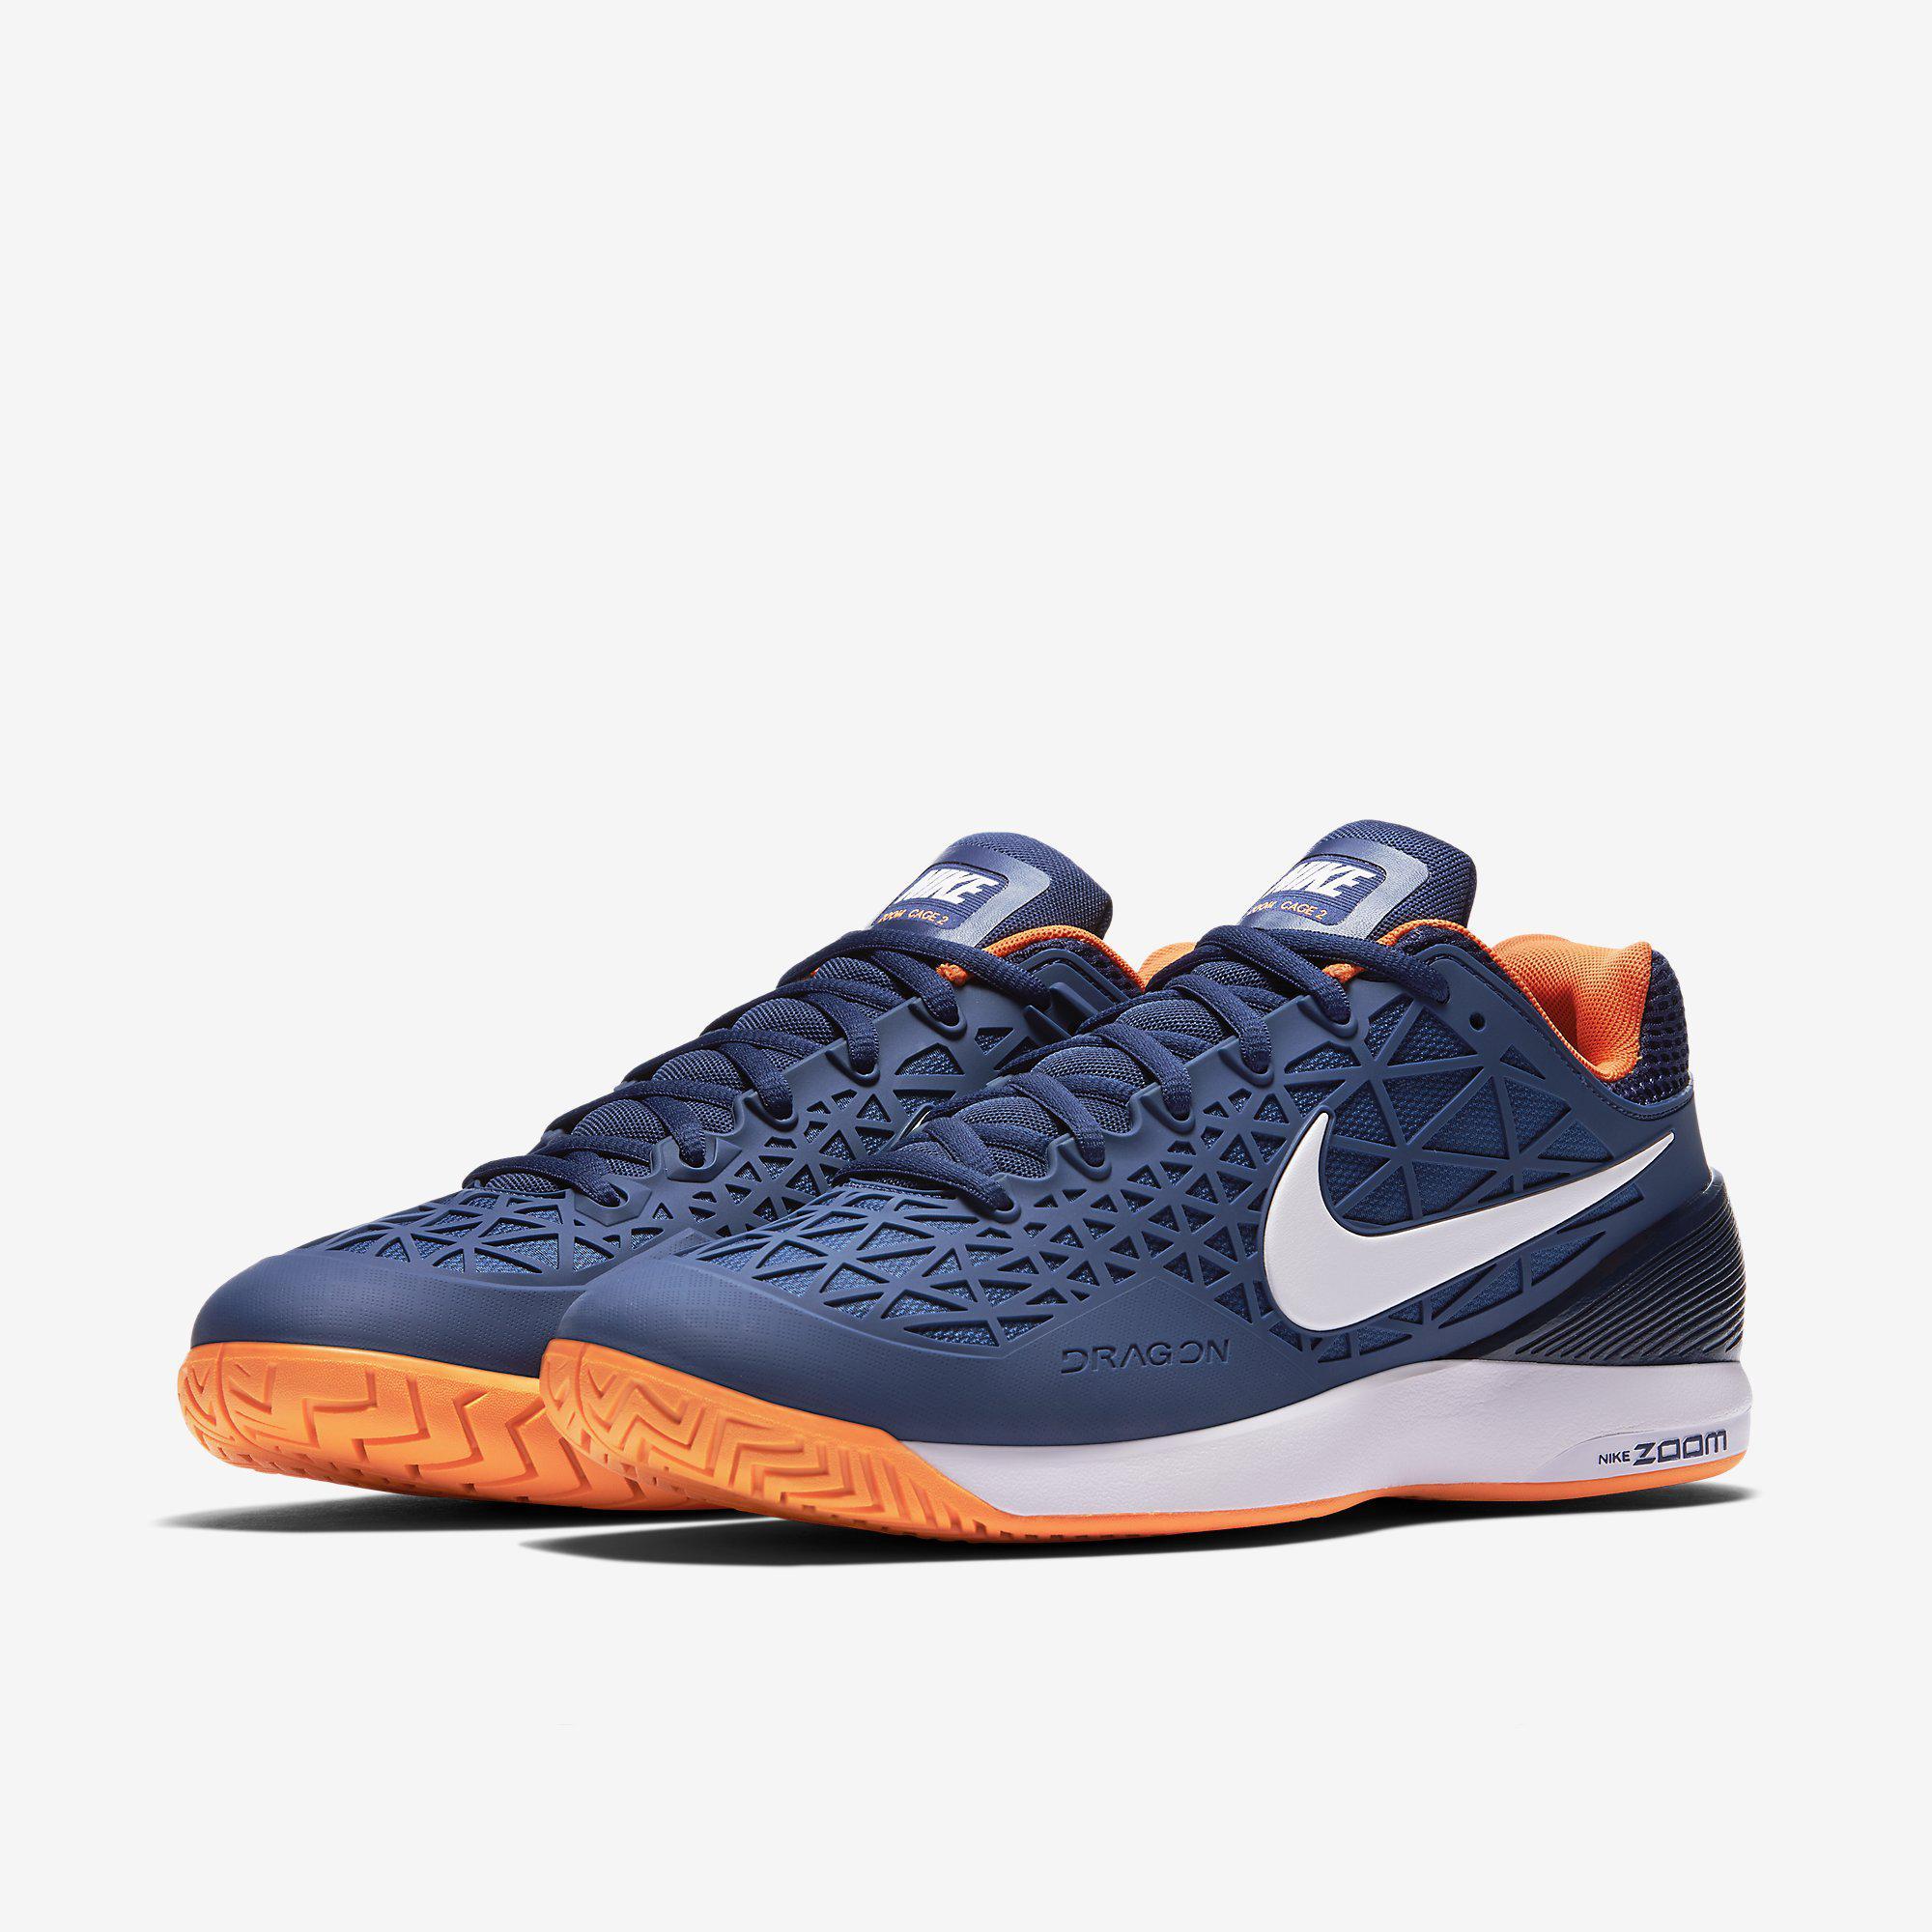 fa1586734a15 Nike Mens Zoom Cage 2 Tennis Shoes - Blue Citrus - Tennisnuts.com